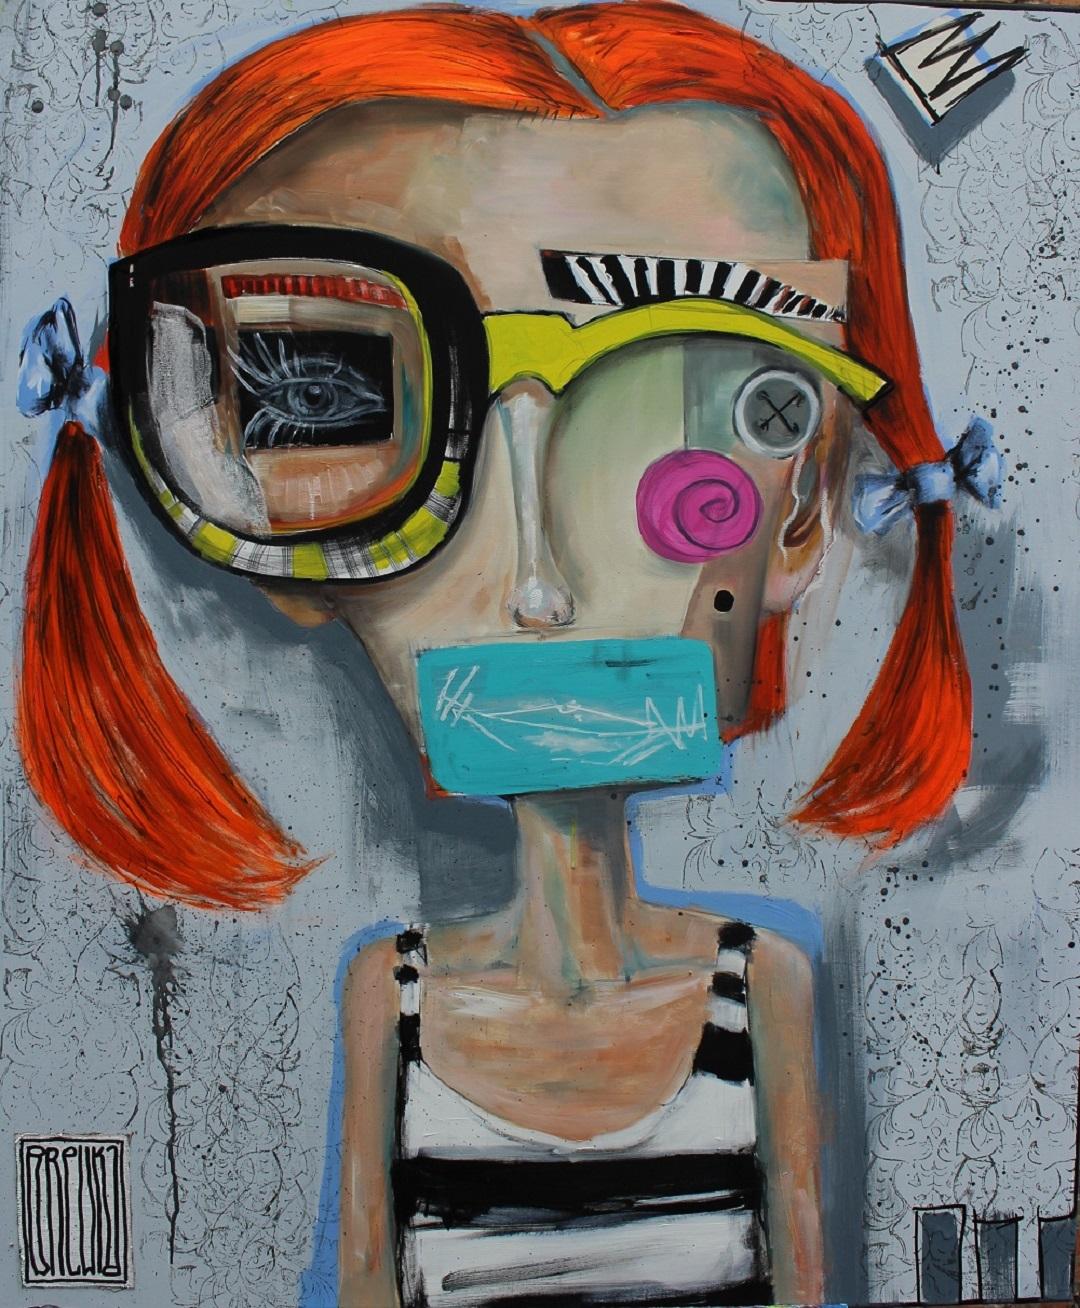 red-headed-girl-brewka-obrazy-my-akryl-plotno